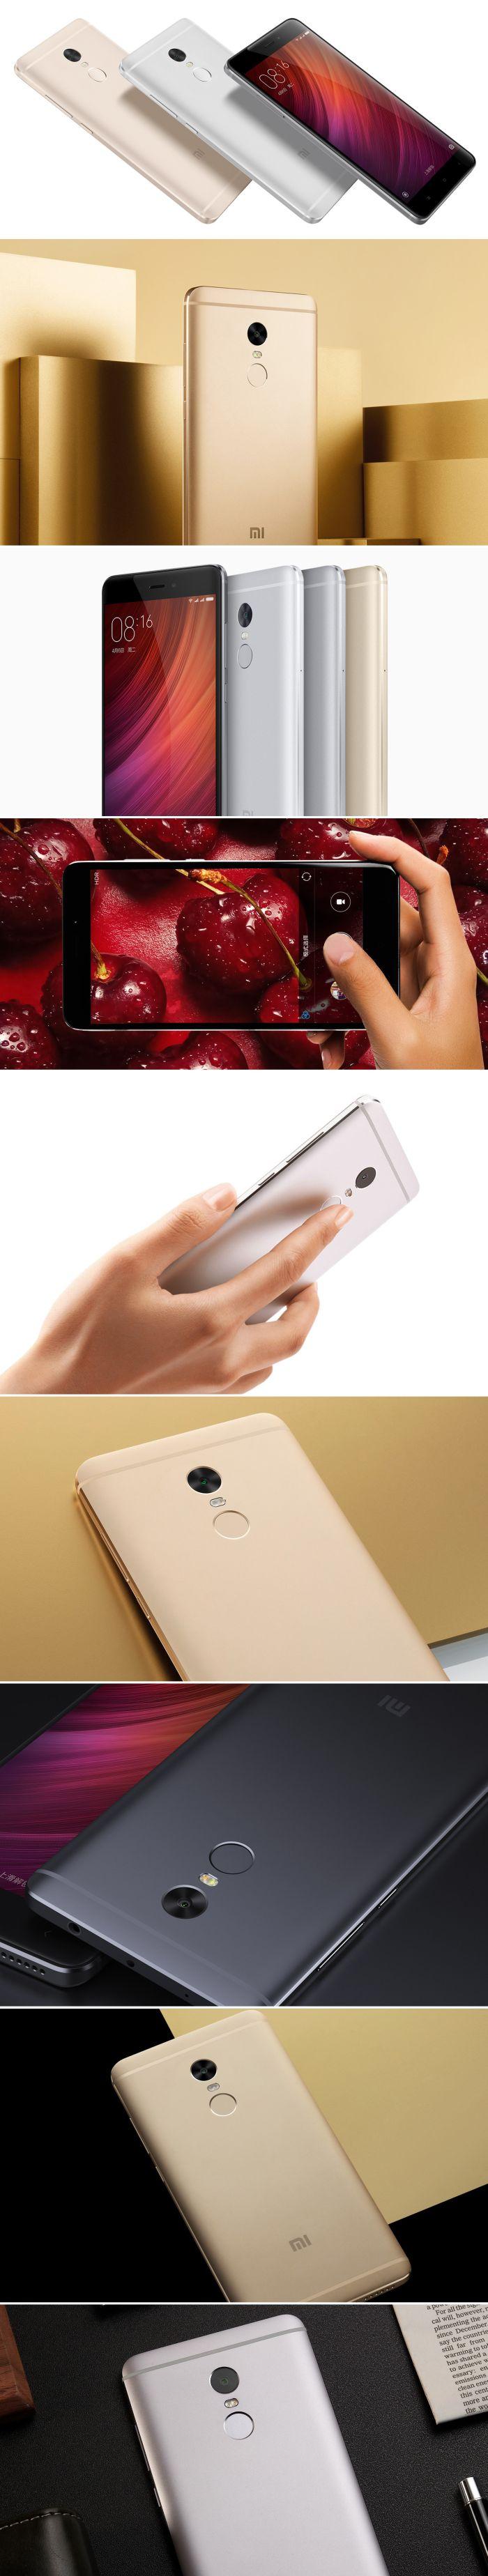 Megjelent a Xiaomi Redmi 4!